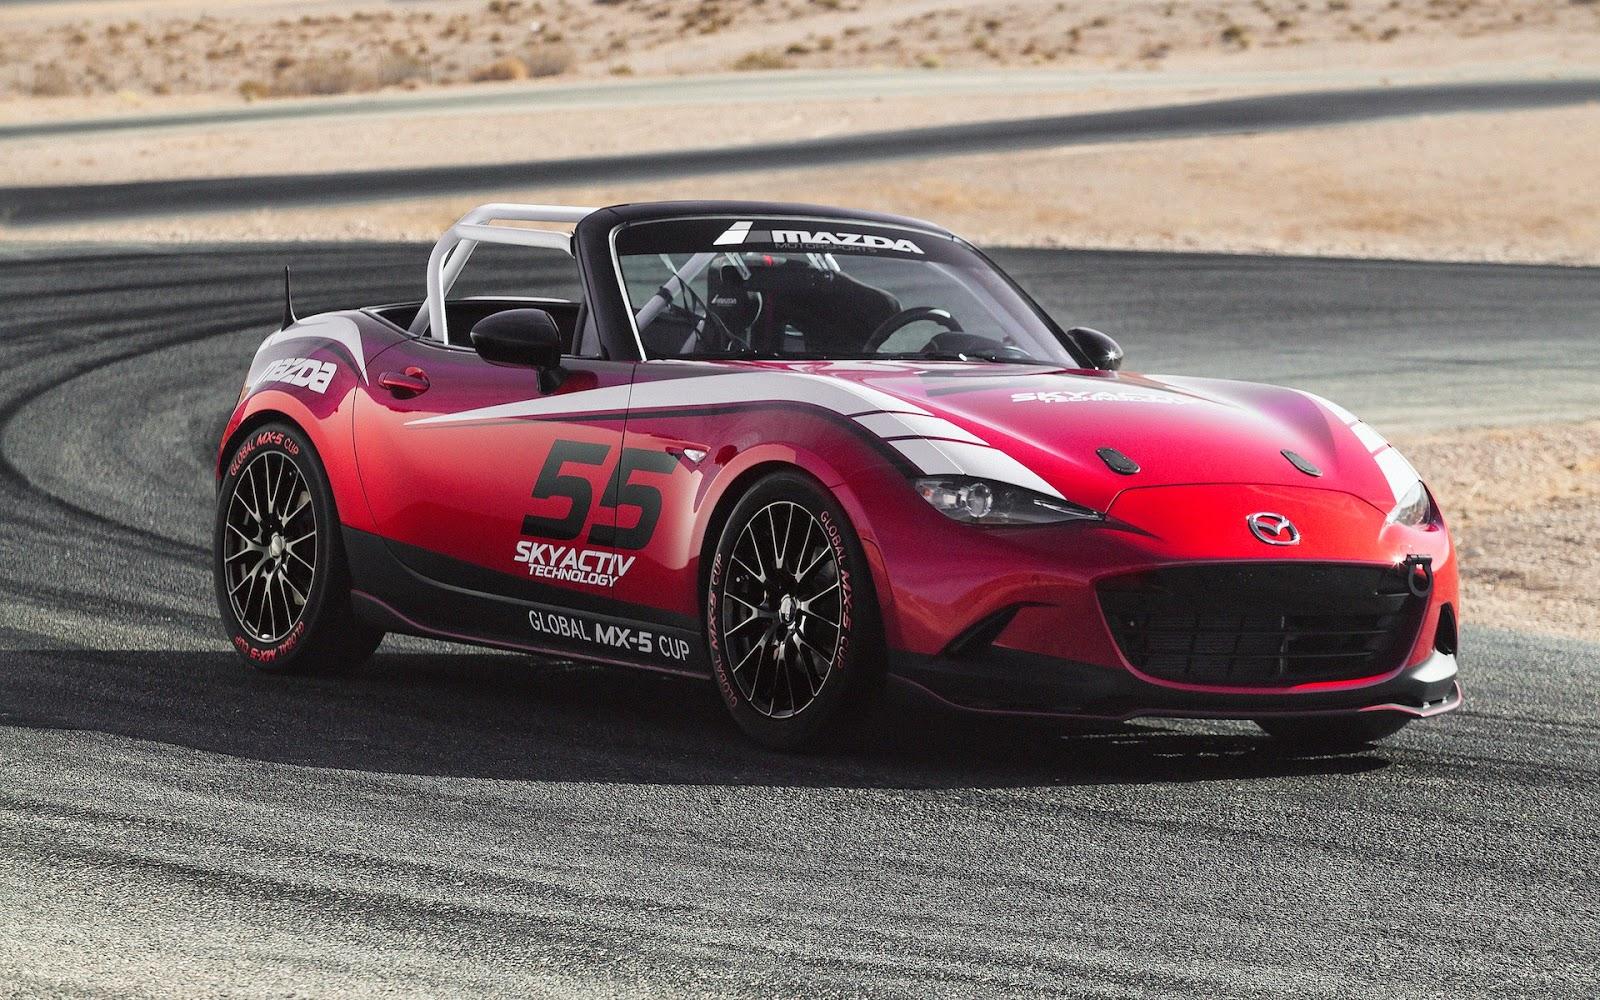 2016 Mazda MX 5 Cup